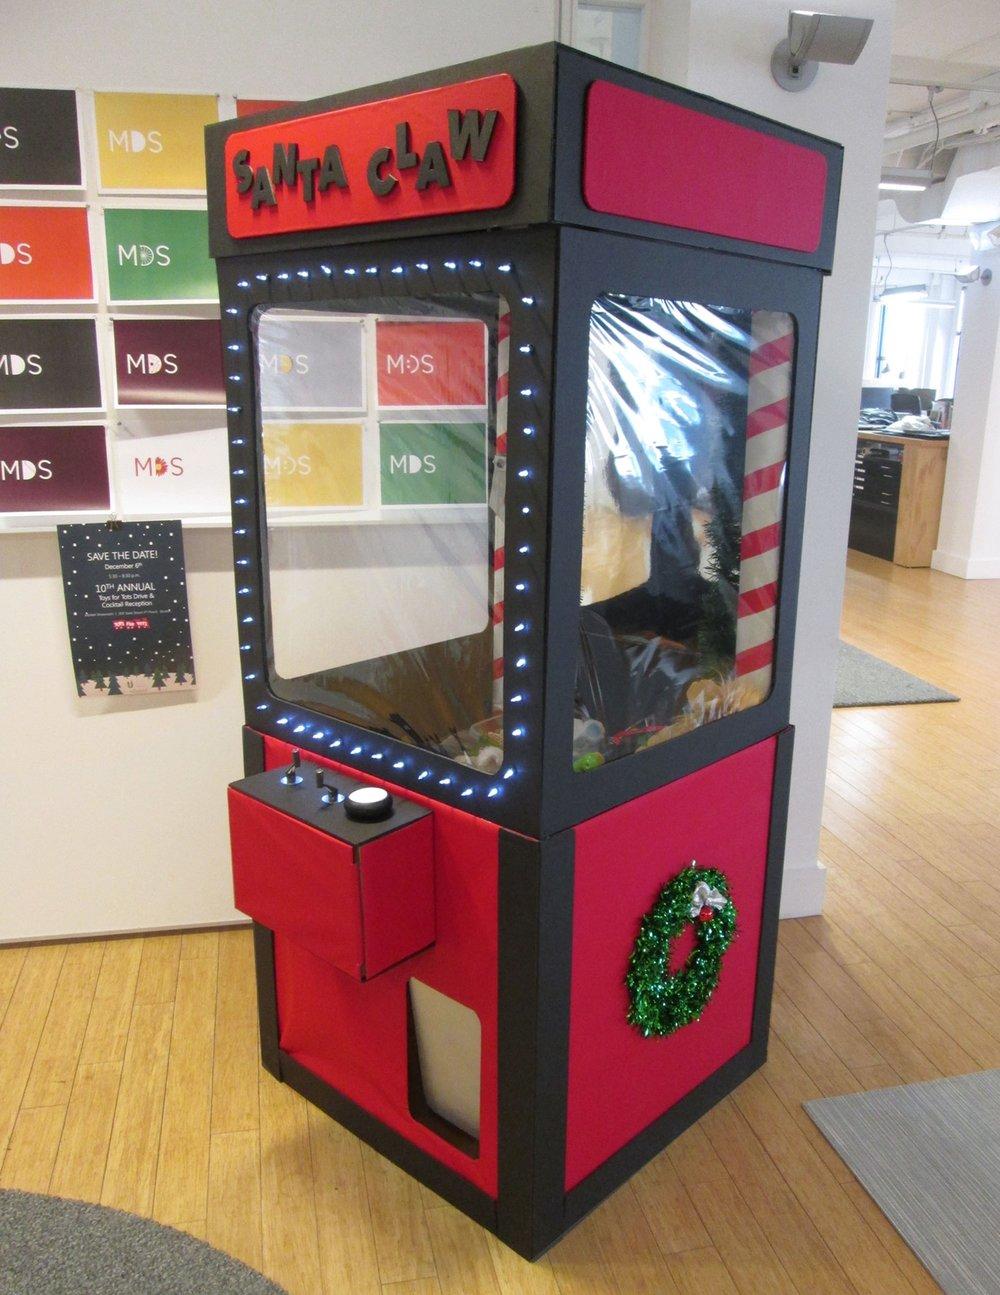 Santa Claw Toy Grabber